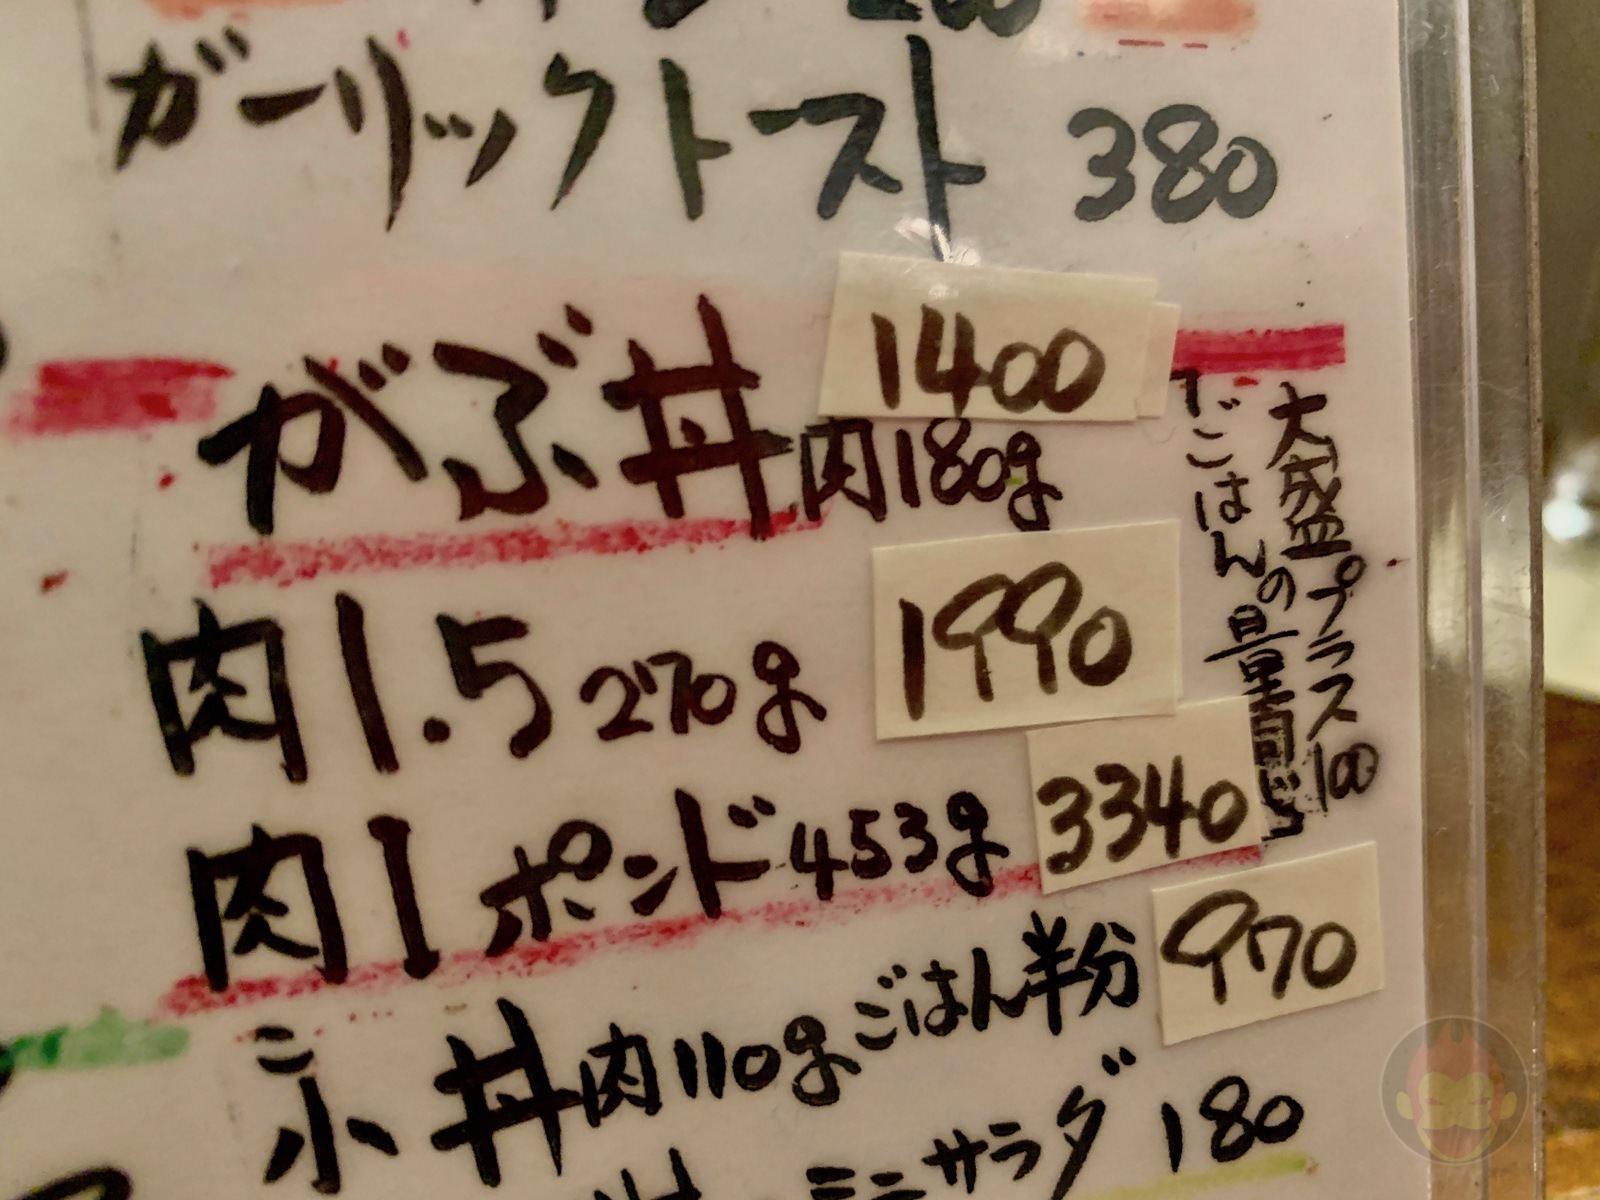 Kuisinbo Gabu Musasi koyama 01